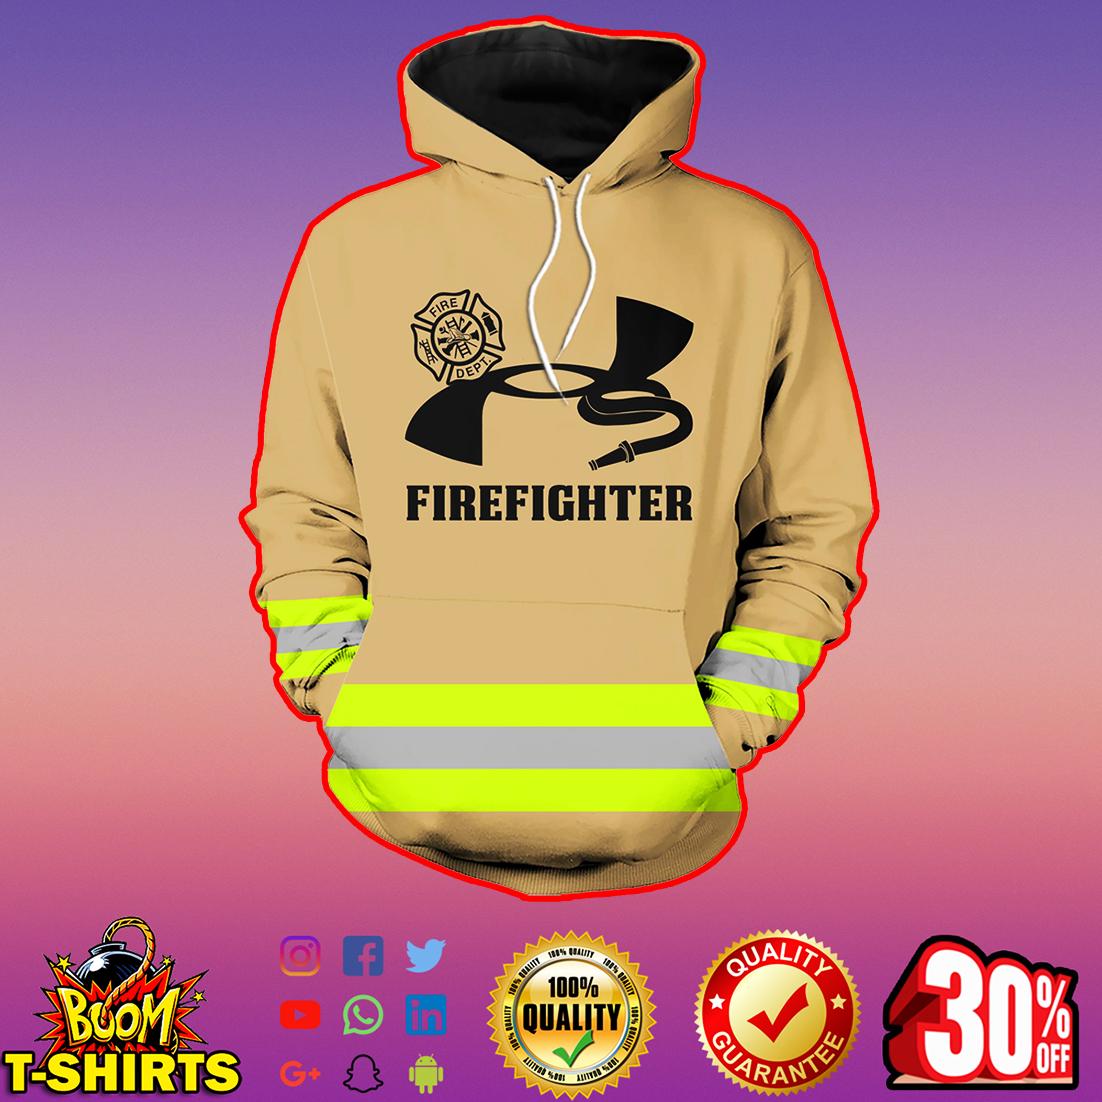 Under Armour Firefighter 3D hoodie